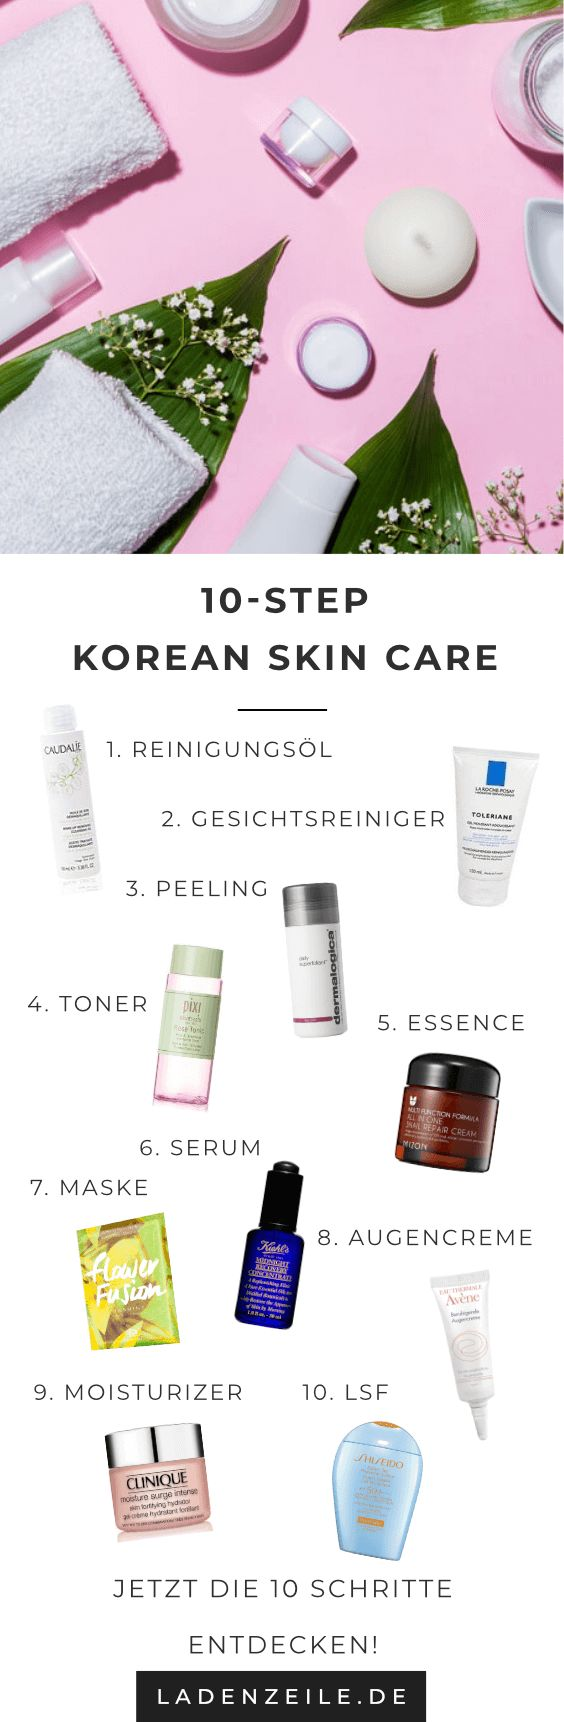 So geht die 10 Step Korean Skin Care Routine